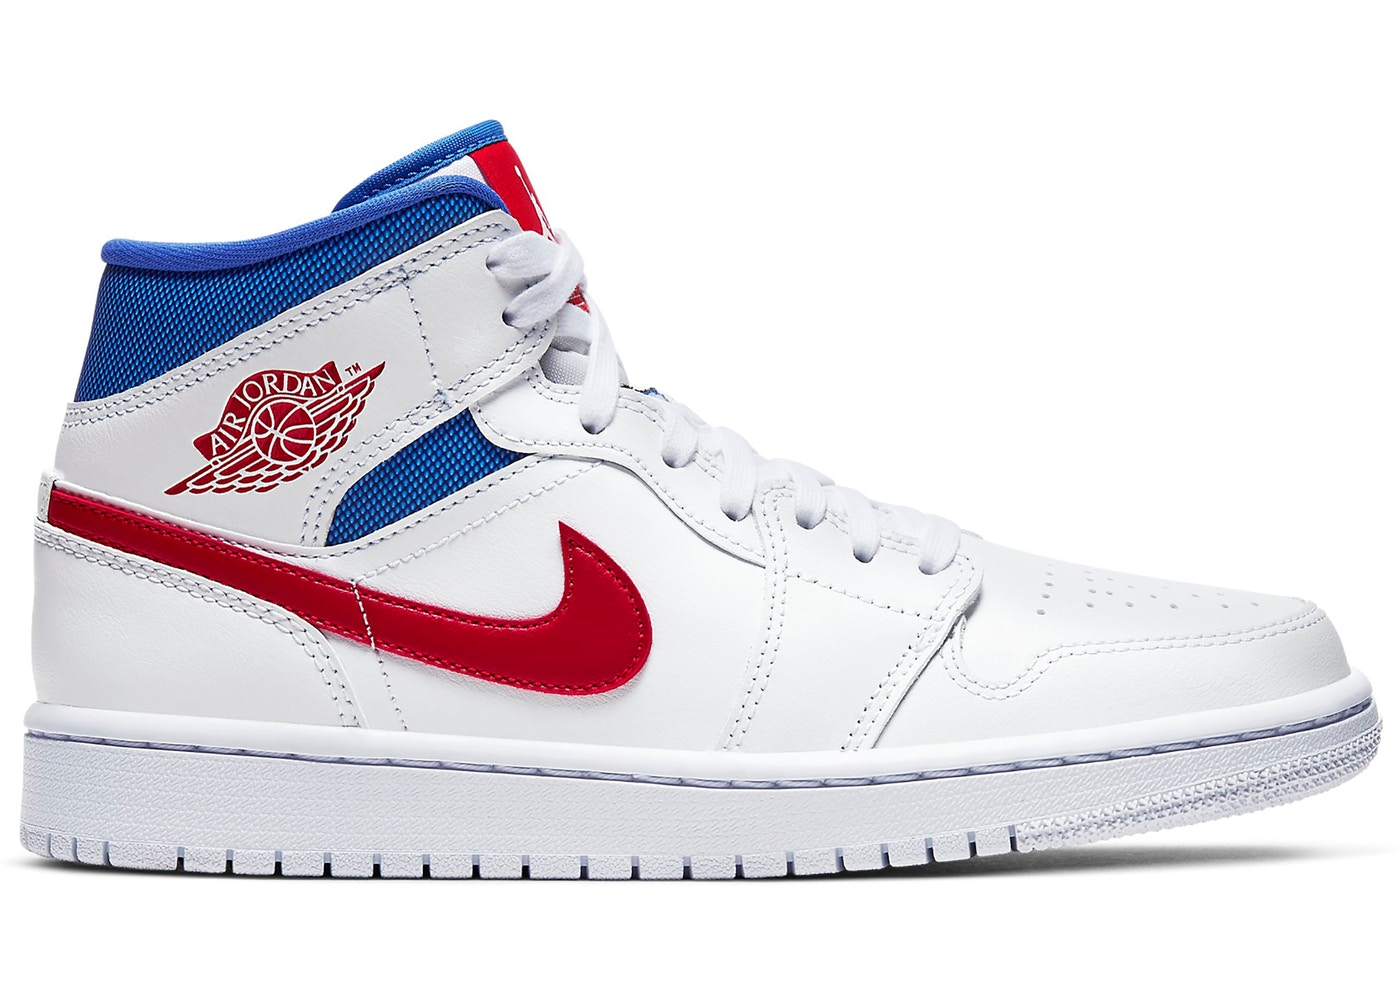 Jordan 1 Mid White Red Royal (W)